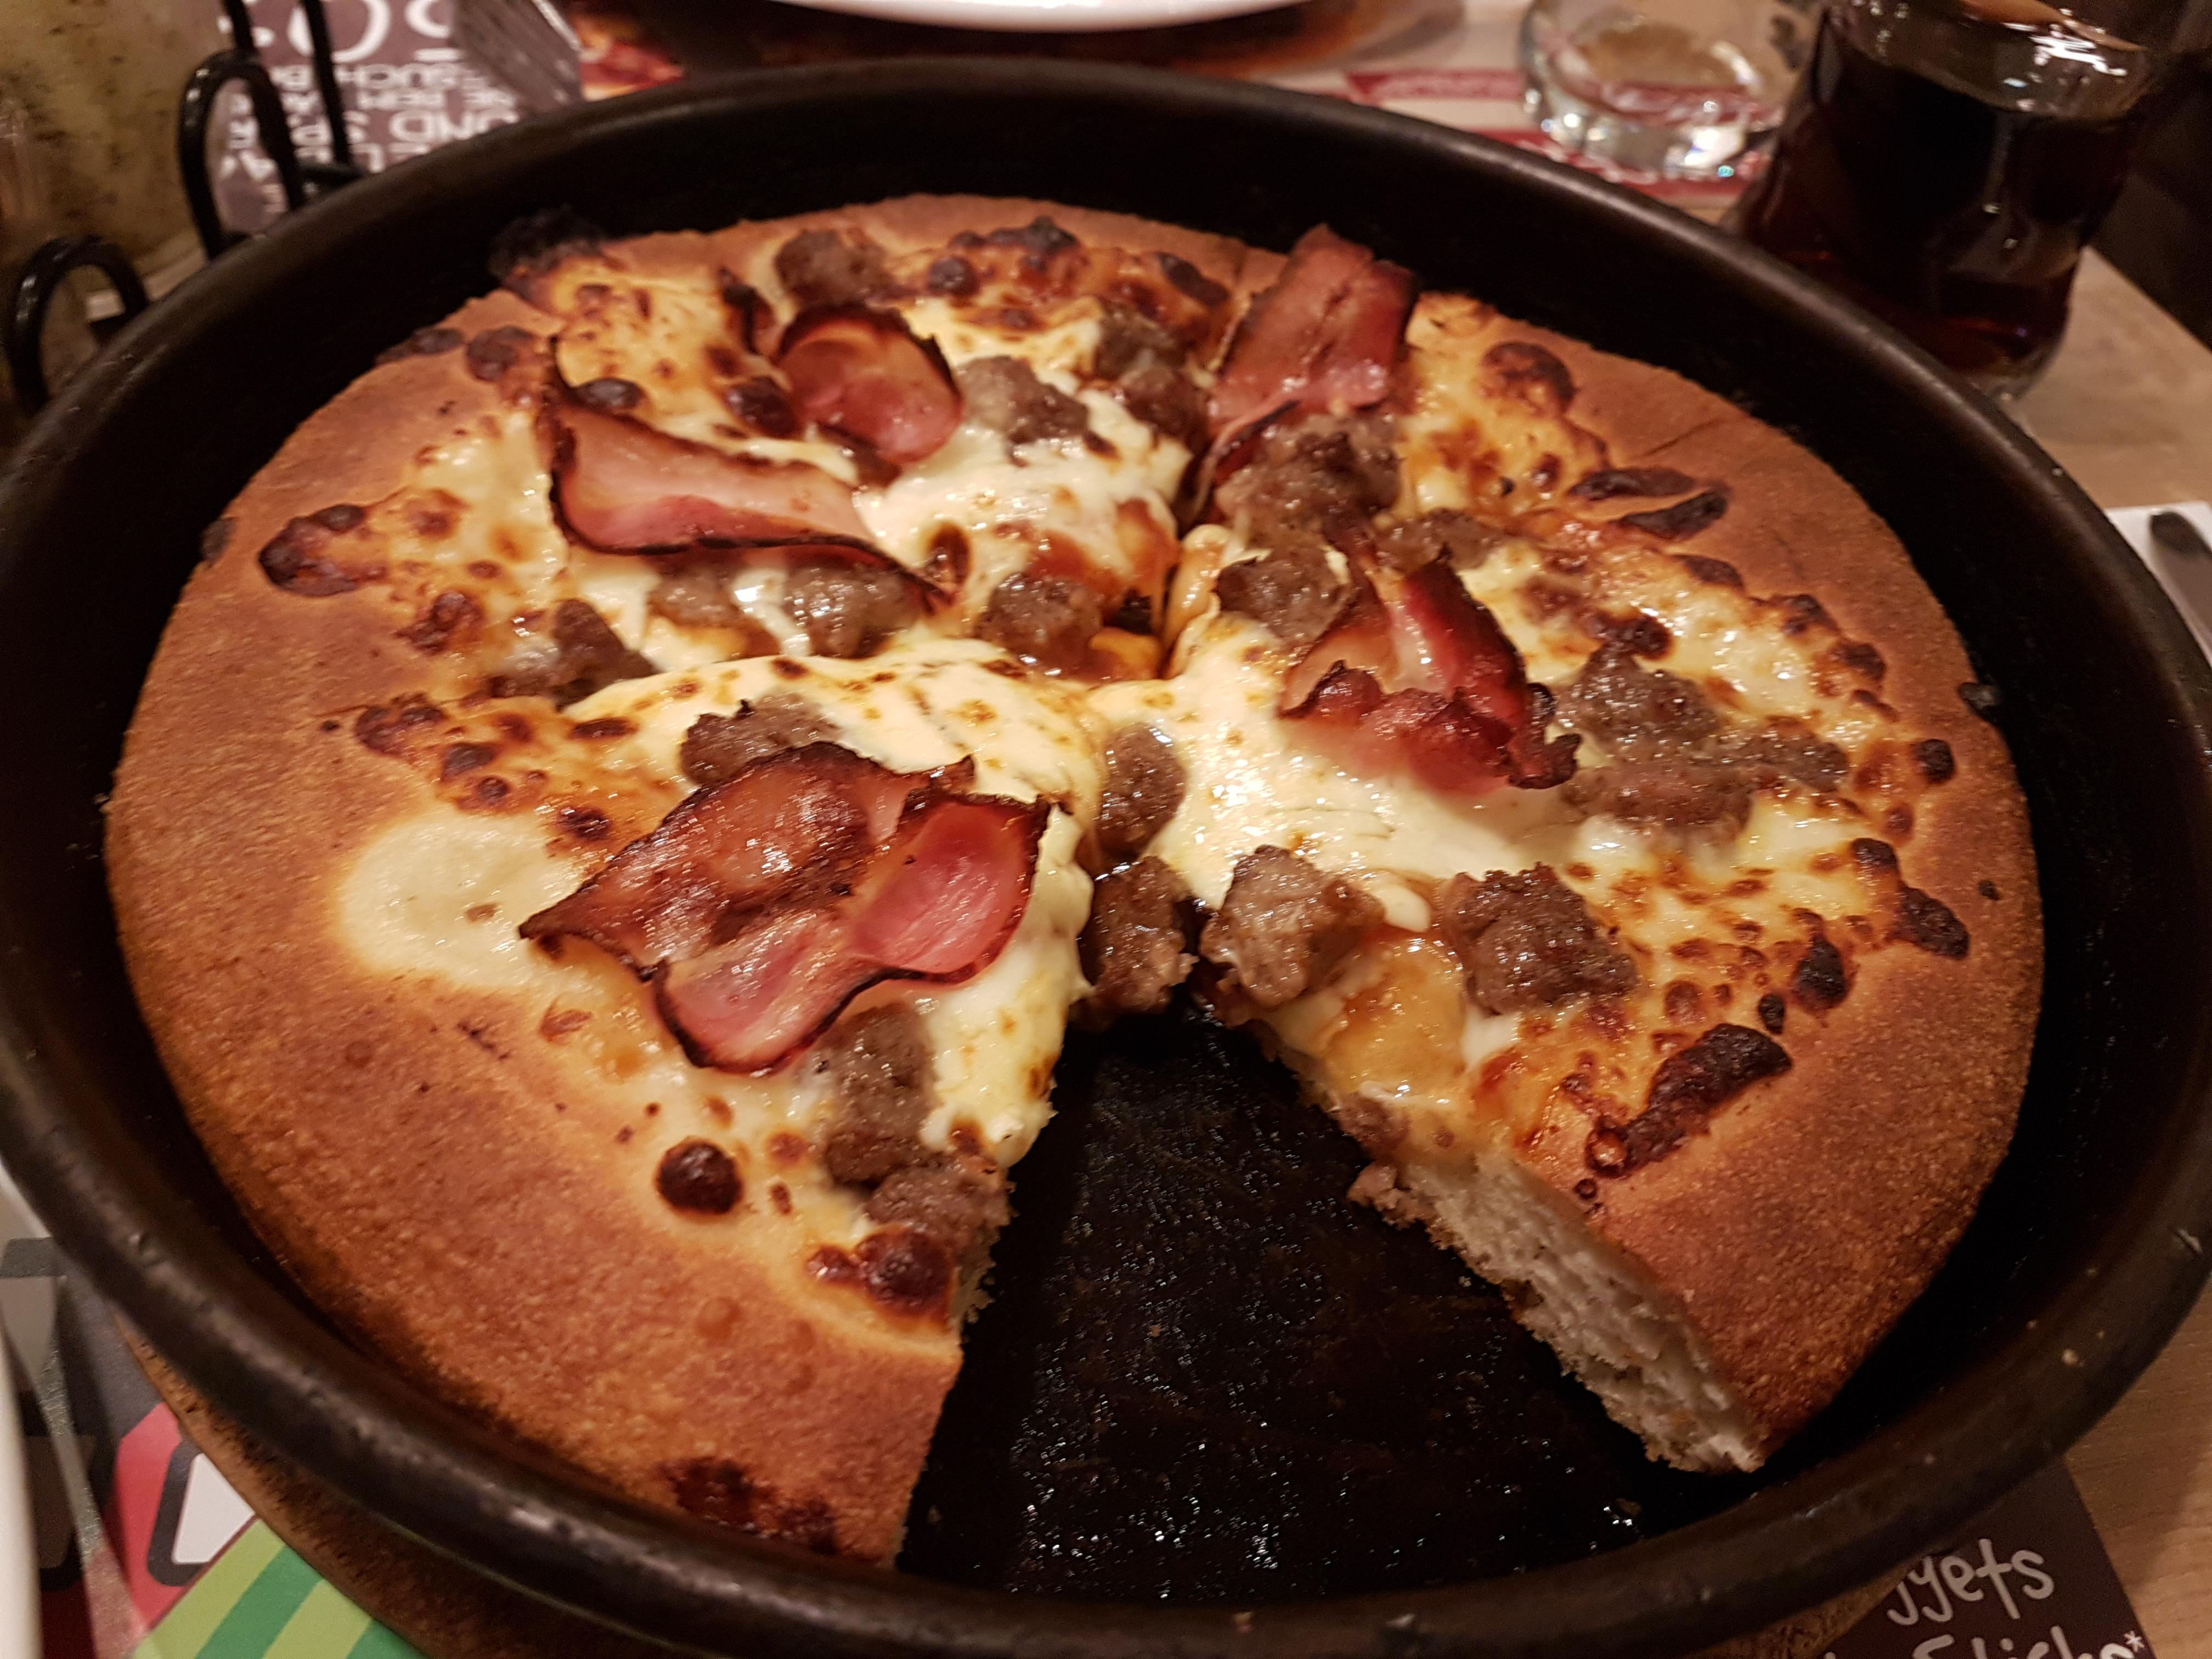 http://foodloader.net/Holz_2018-02-24_Pizza.jpg